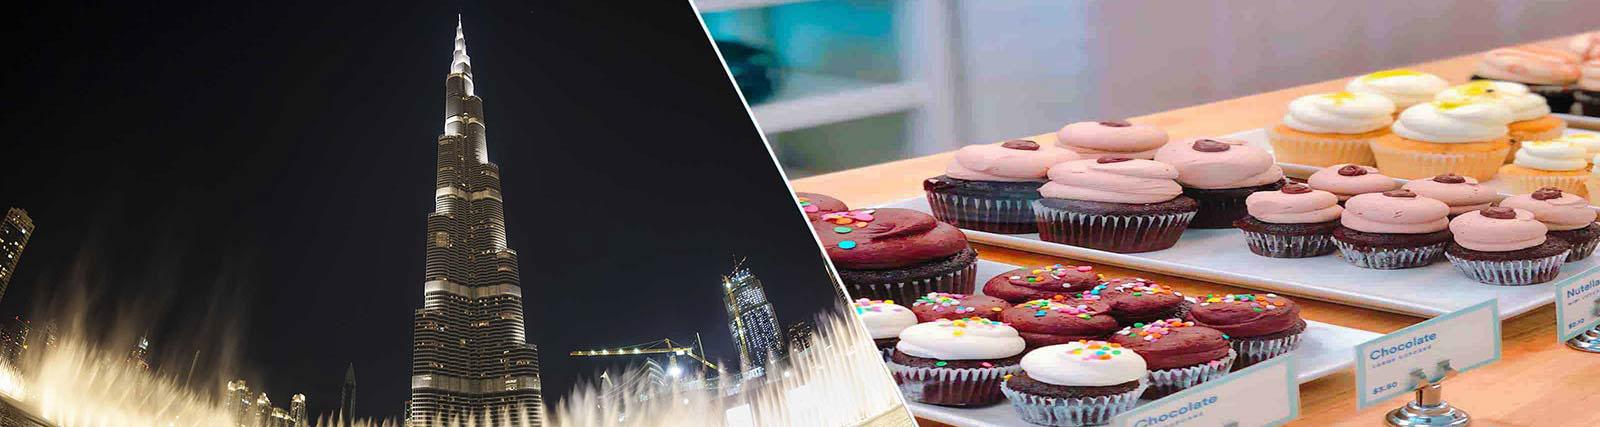 Burj khalifa with cafe pastry